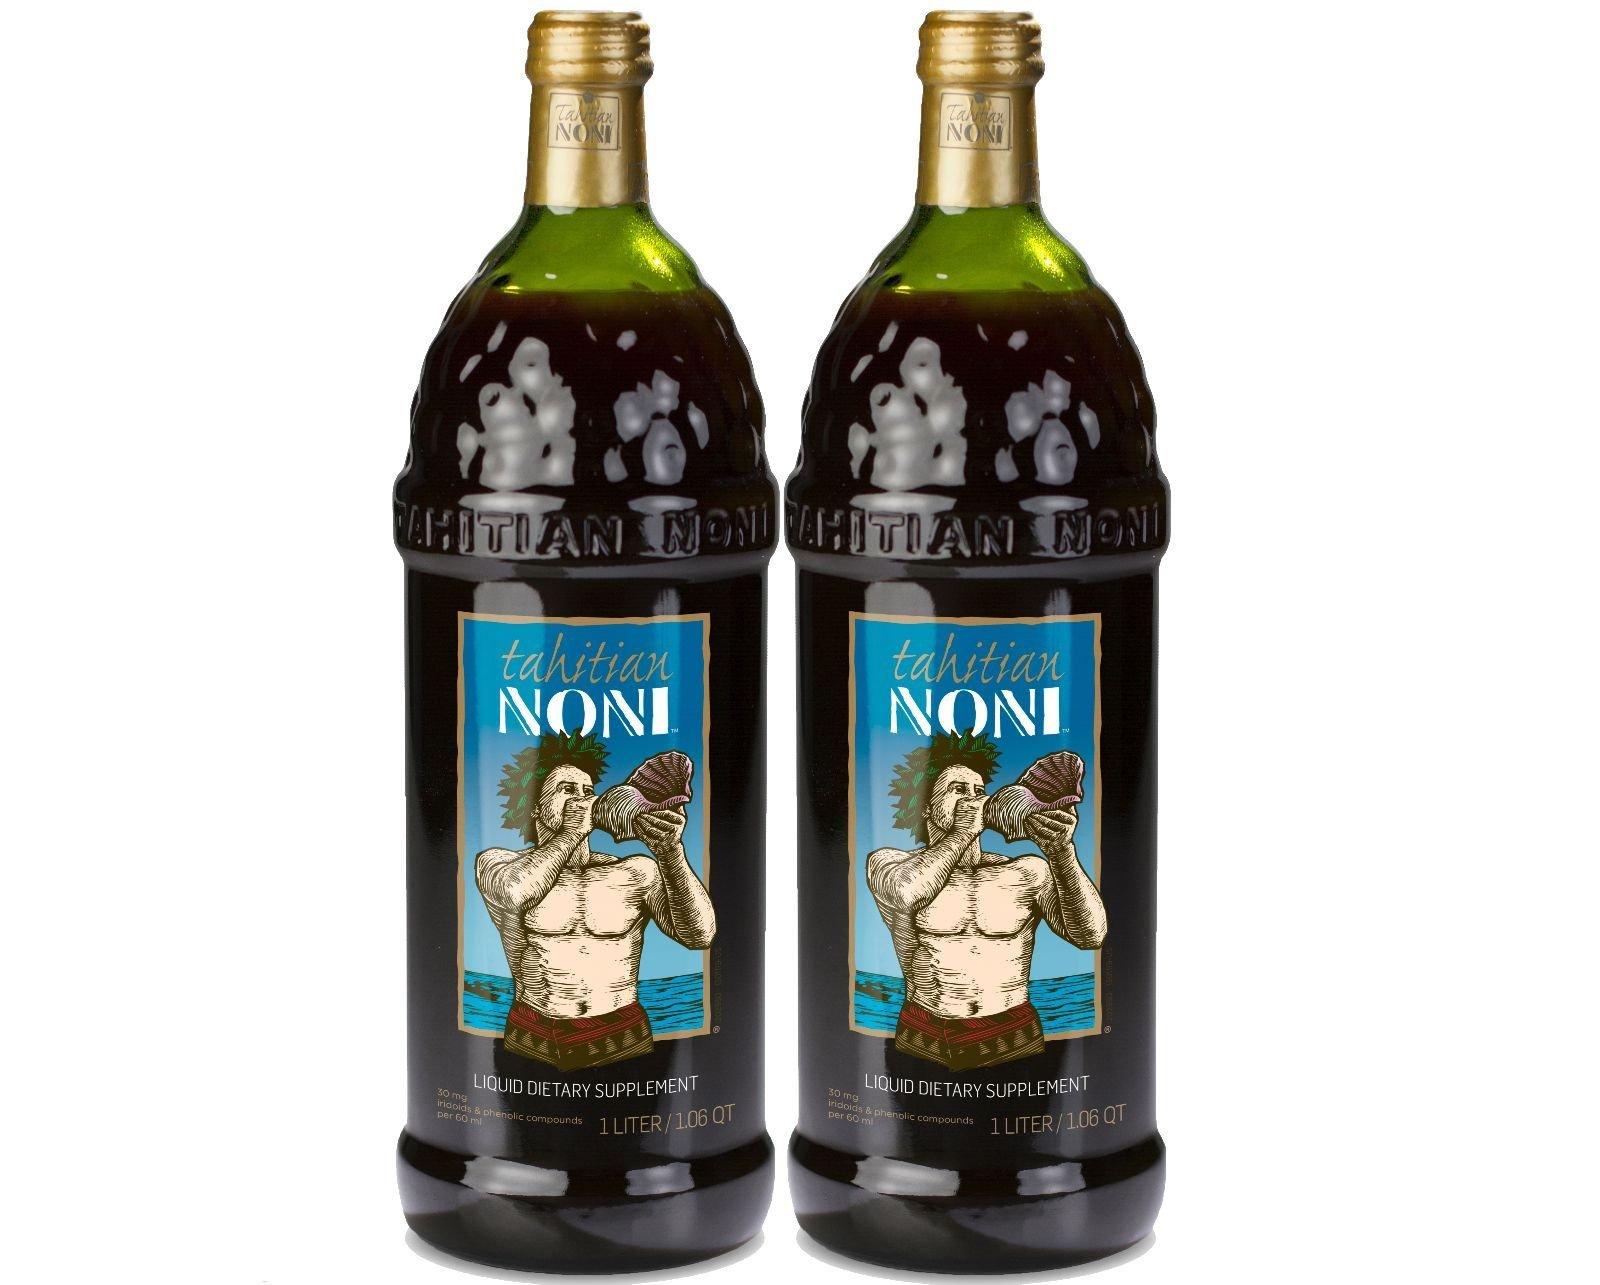 TAHITIAN NONI Juice by Morinda 2PK Case (Two 1 Liter Bottles per Case) by Tahitian Noni (Image #1)